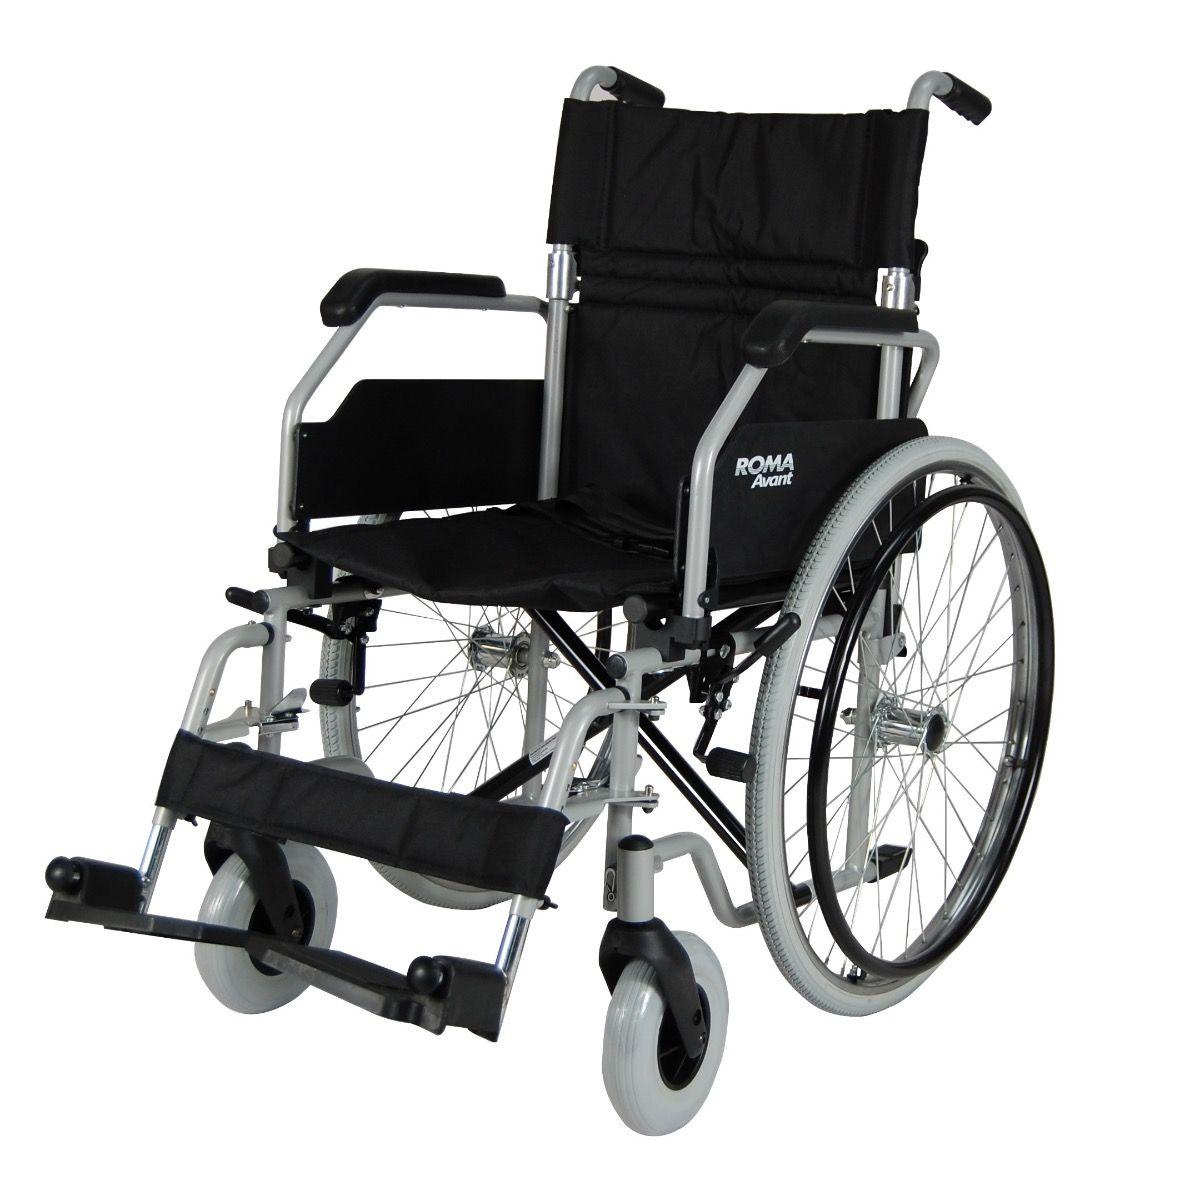 Roma Avant Car Self Propelled Wheelchair Side View